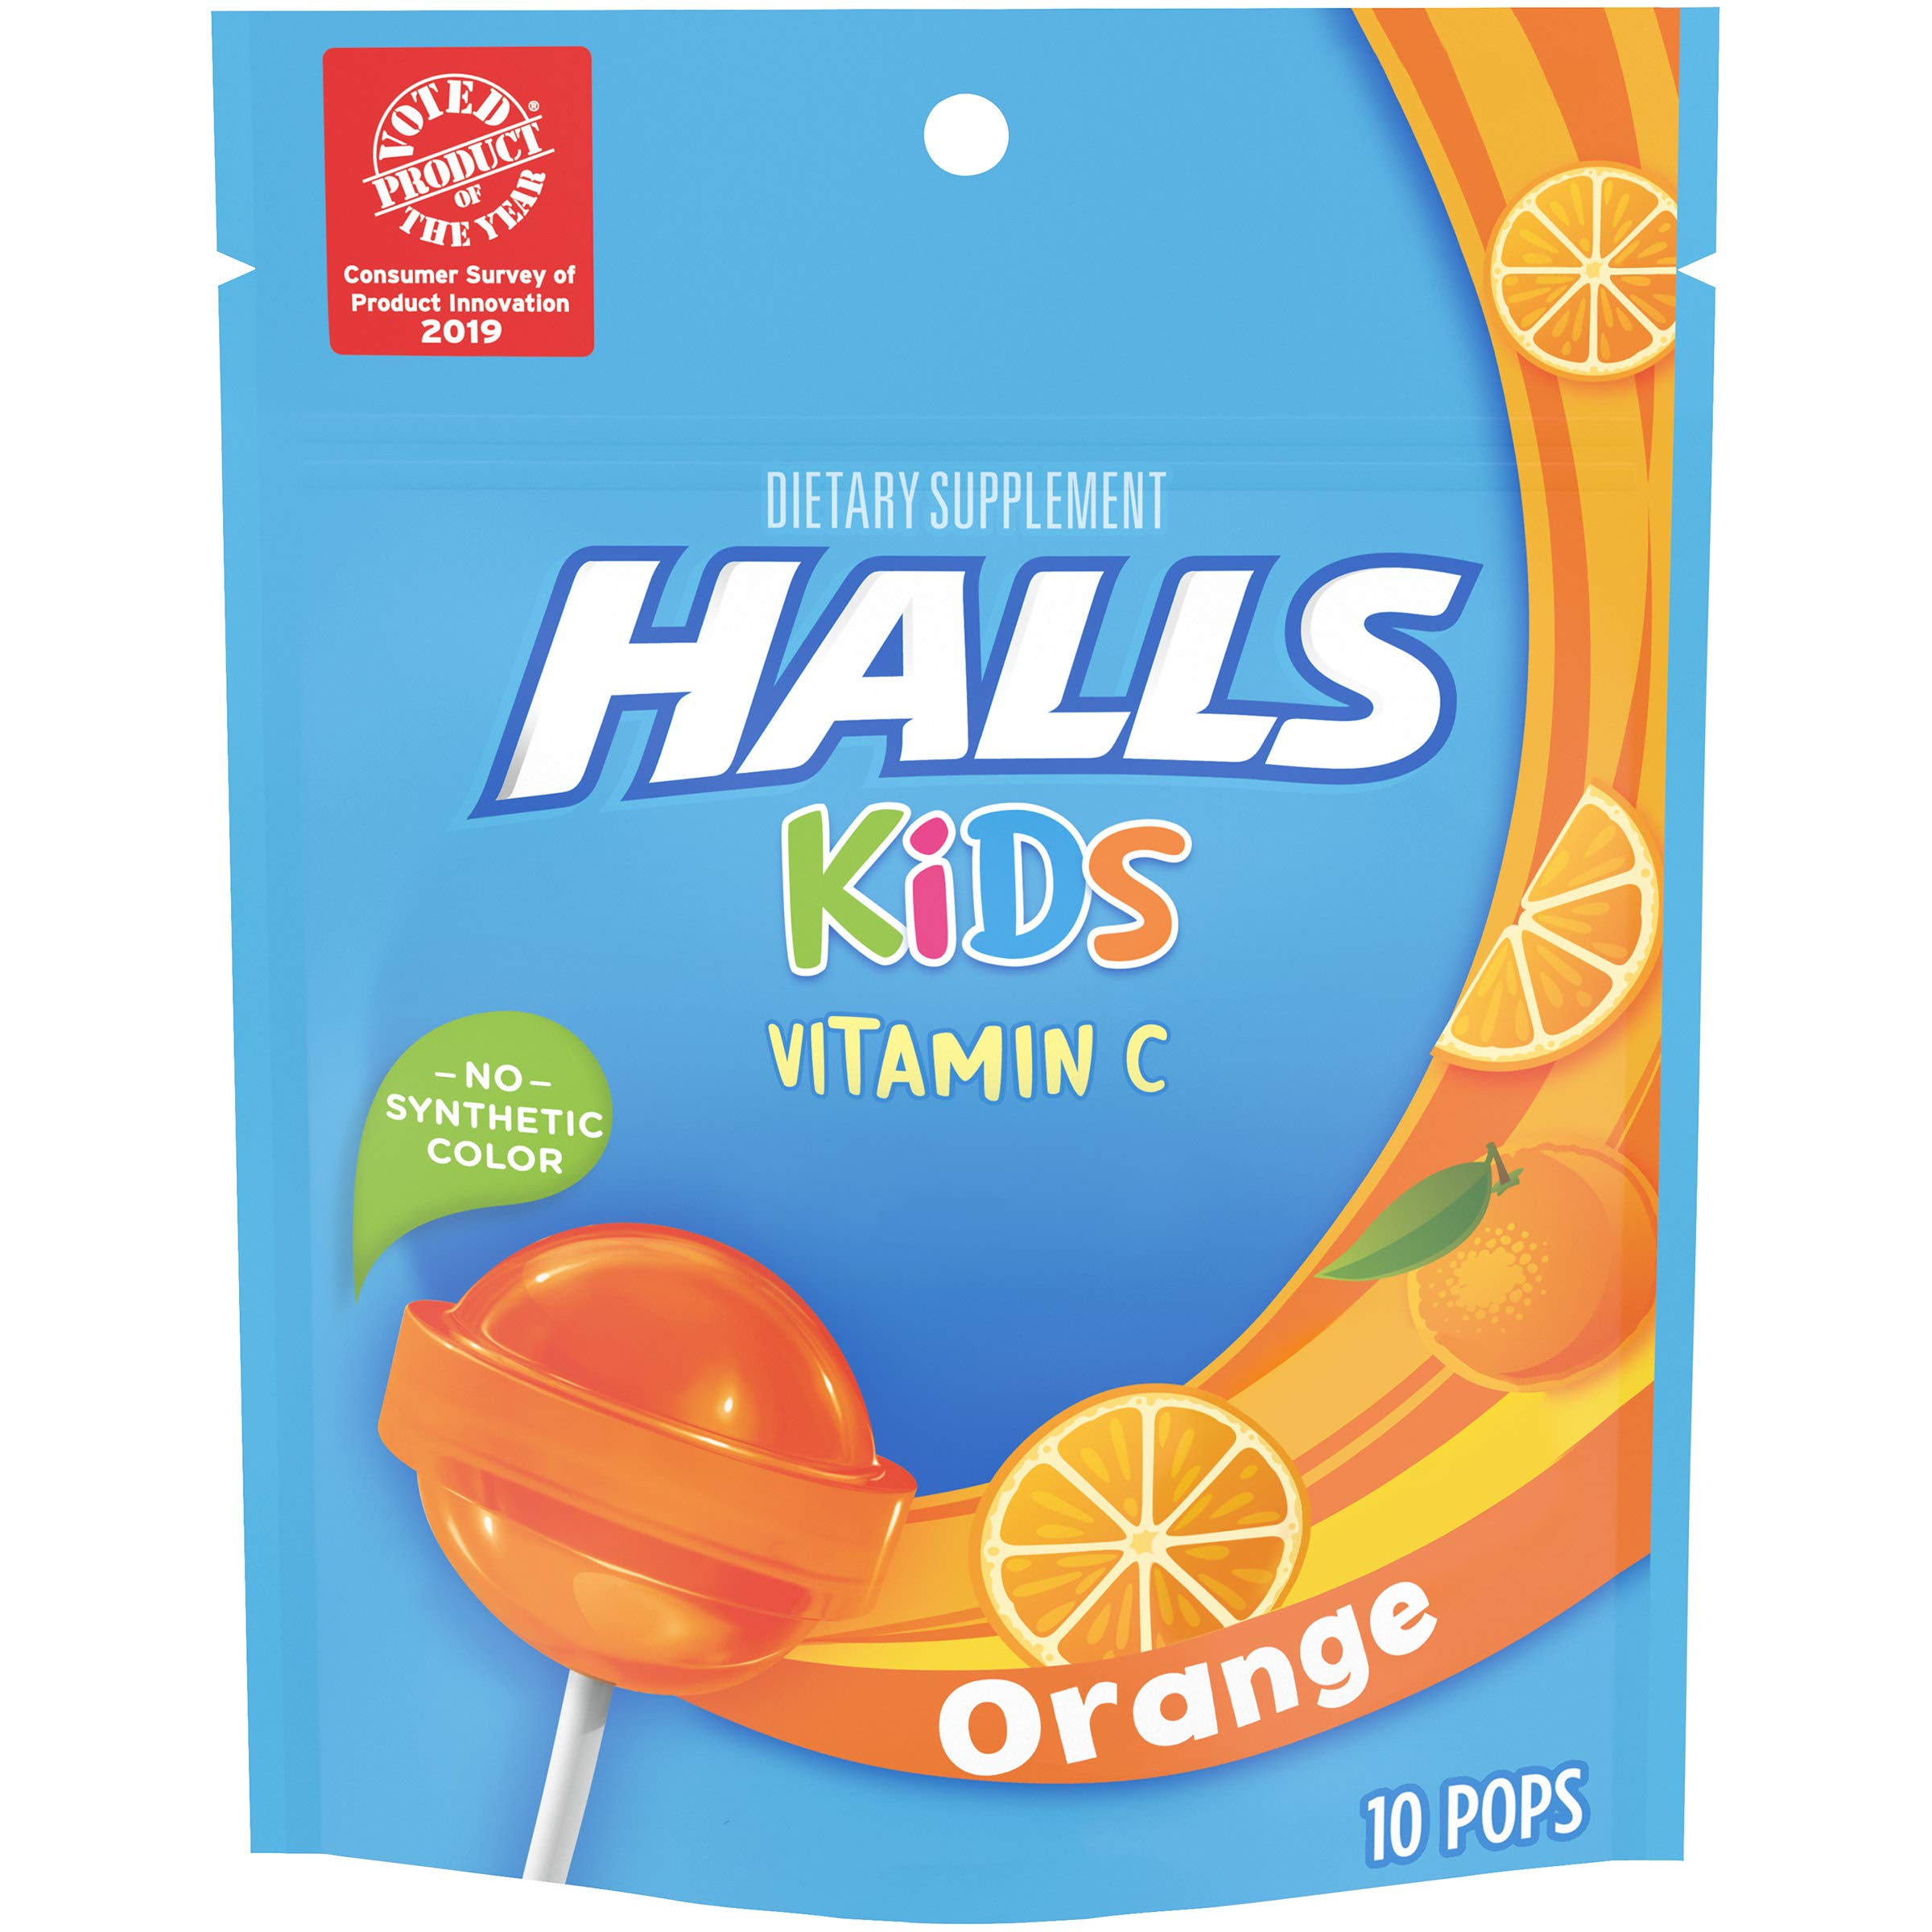 Halls Kids Orange Vitamin C Pops - for Children - 10 Pops (1 bag of 10 Pops)